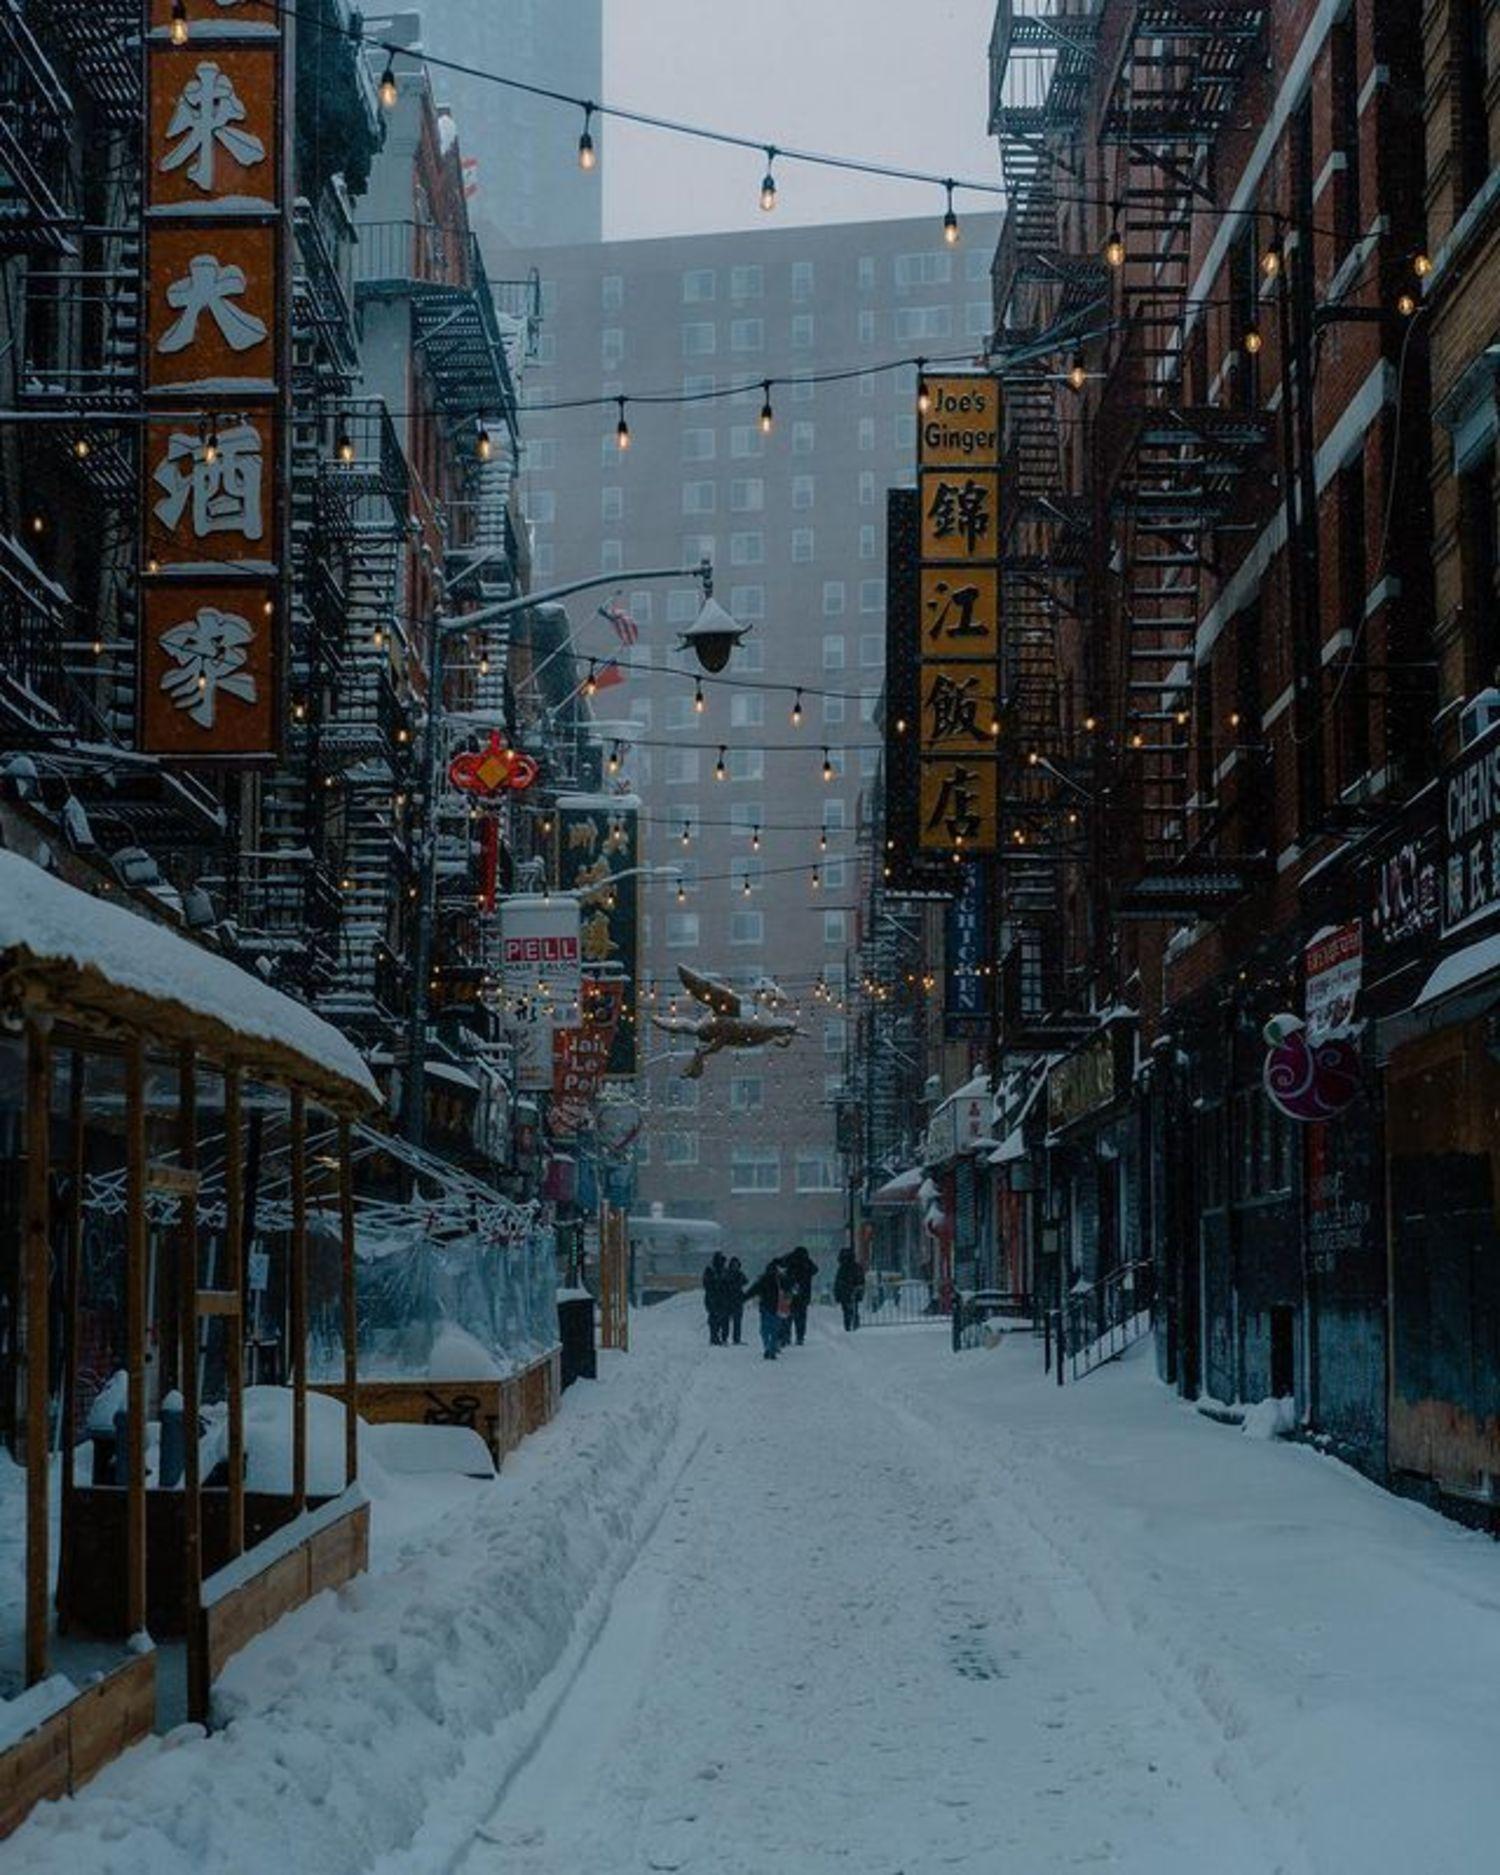 Pell Street, Chinatown, Manhattan